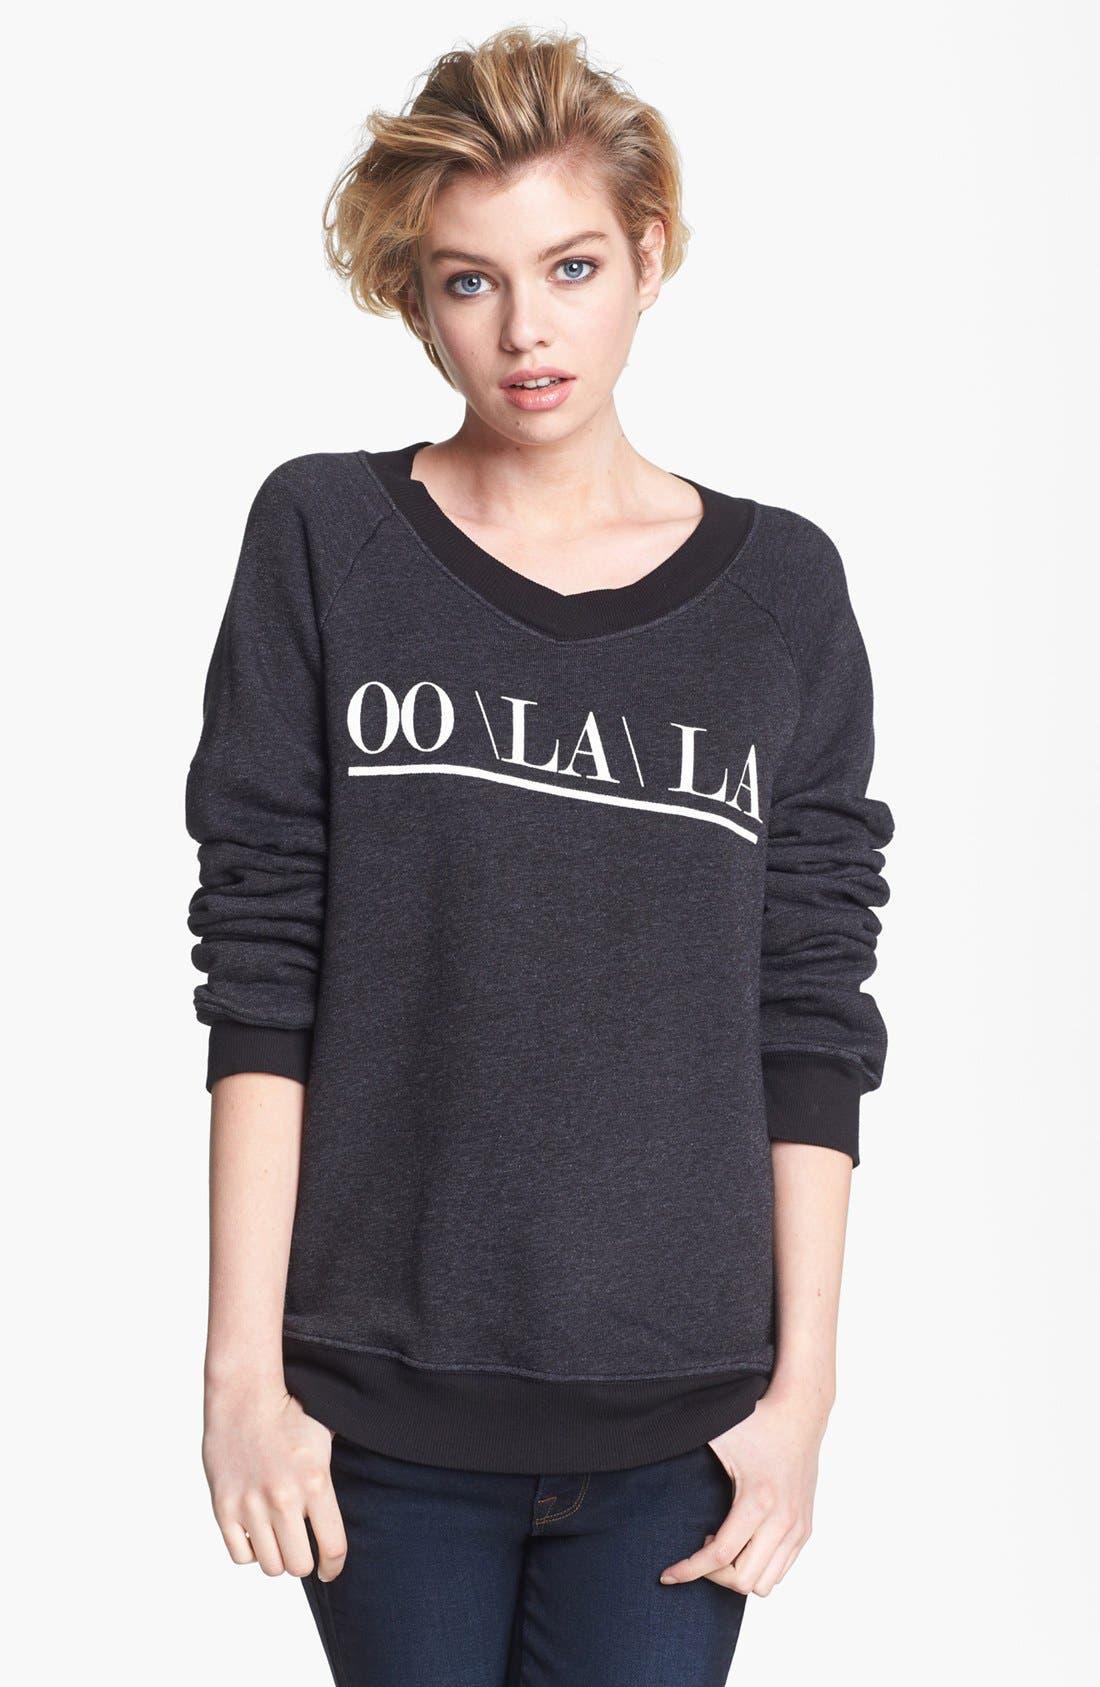 Alternate Image 1 Selected - Wildfox 'Oo La La' Sweatshirt